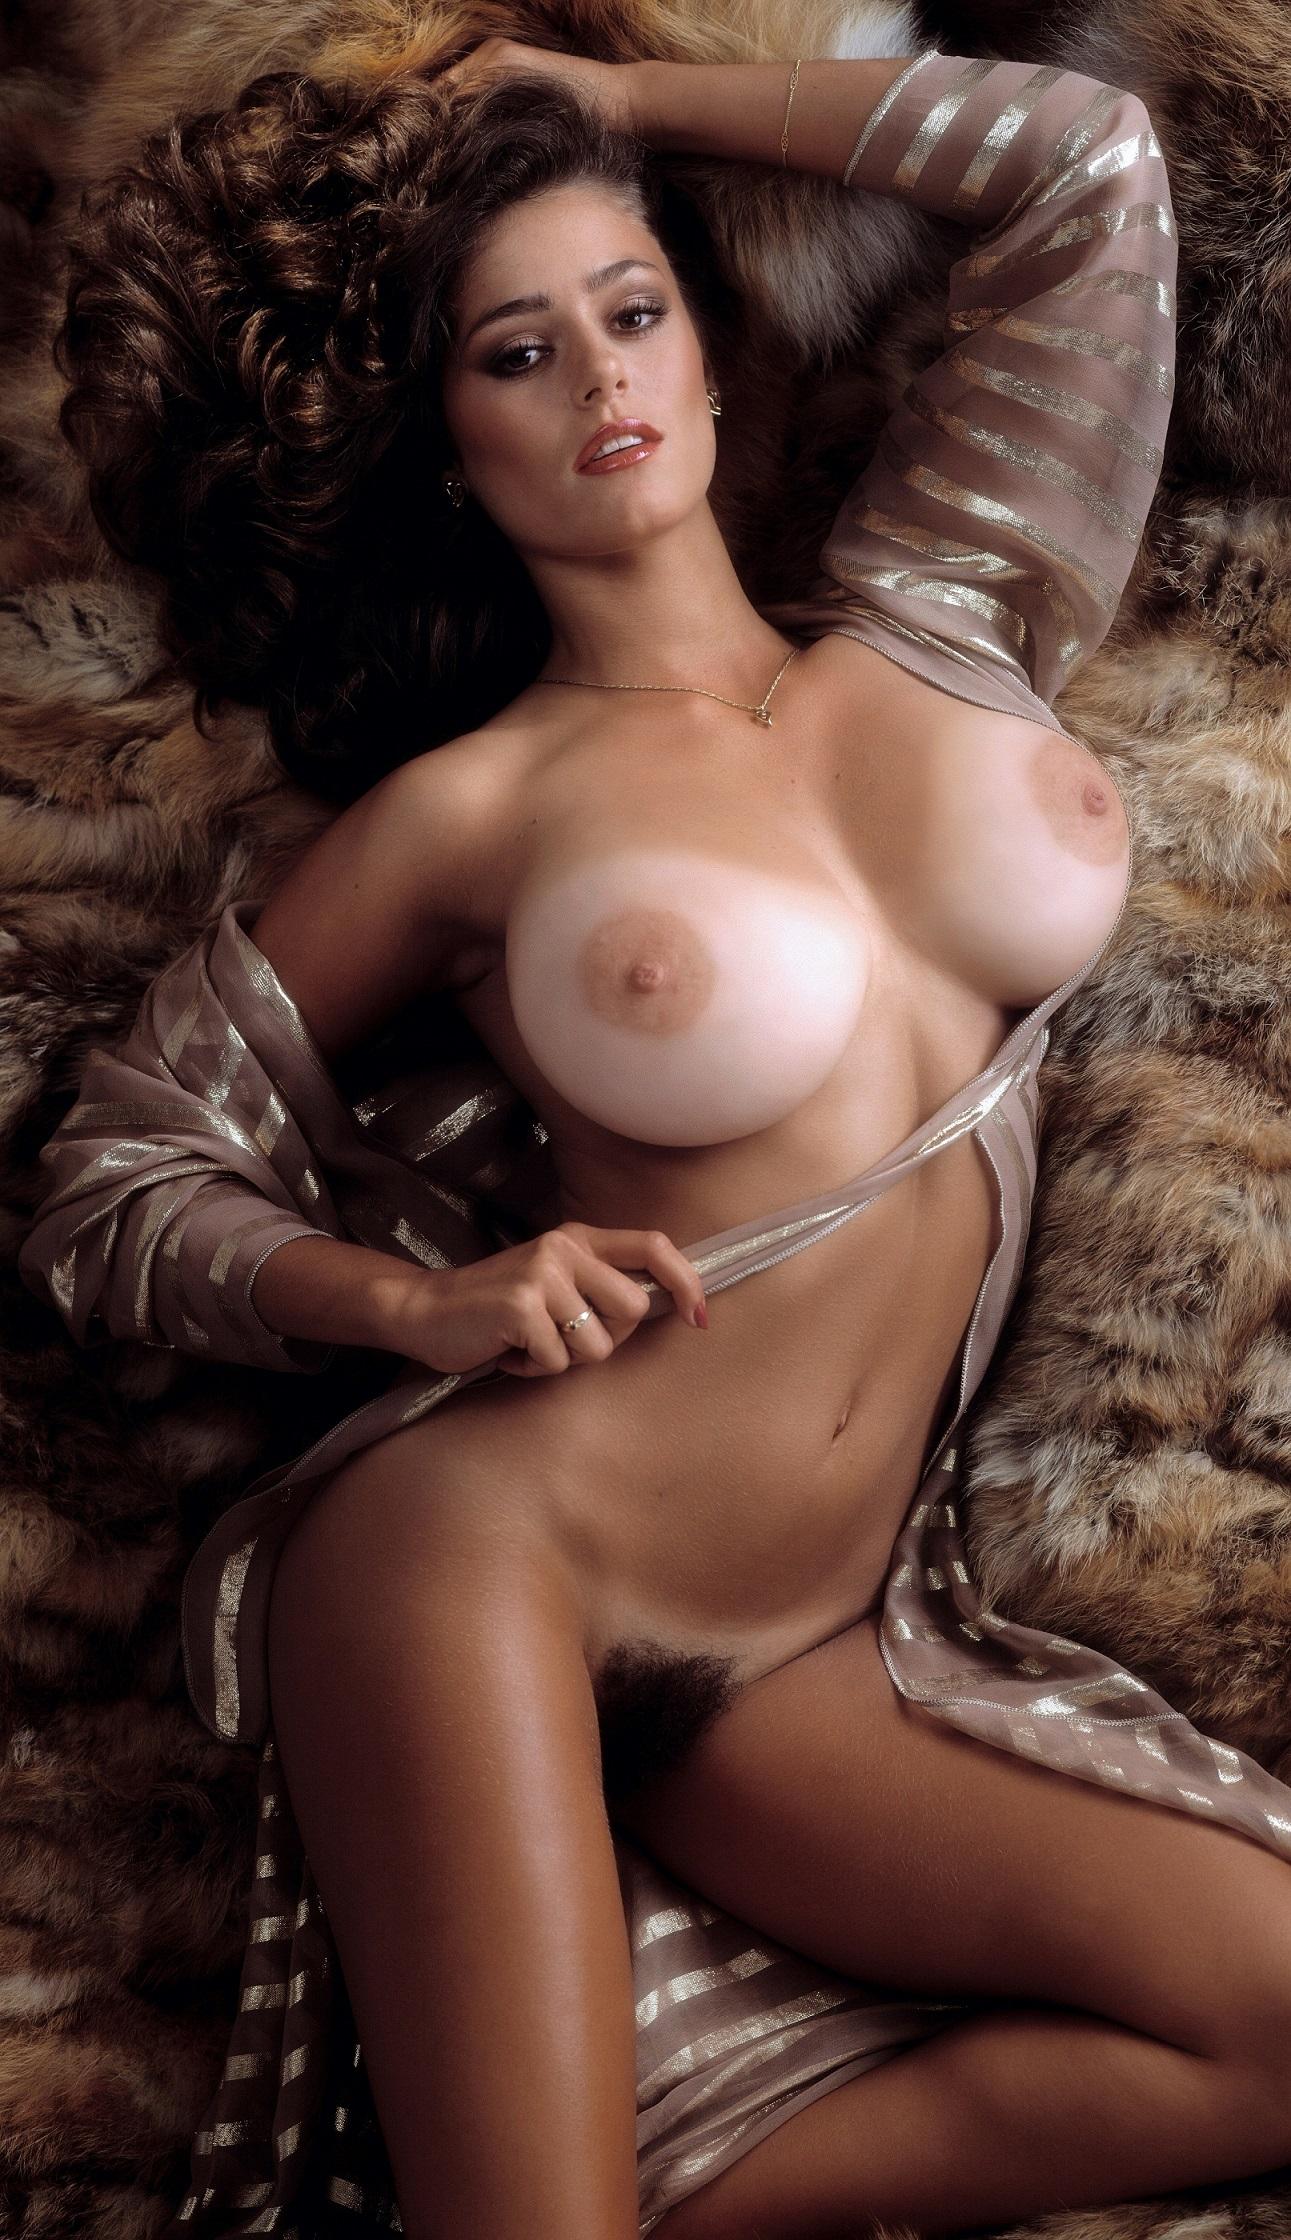 Vintage playboy big tits, naked america